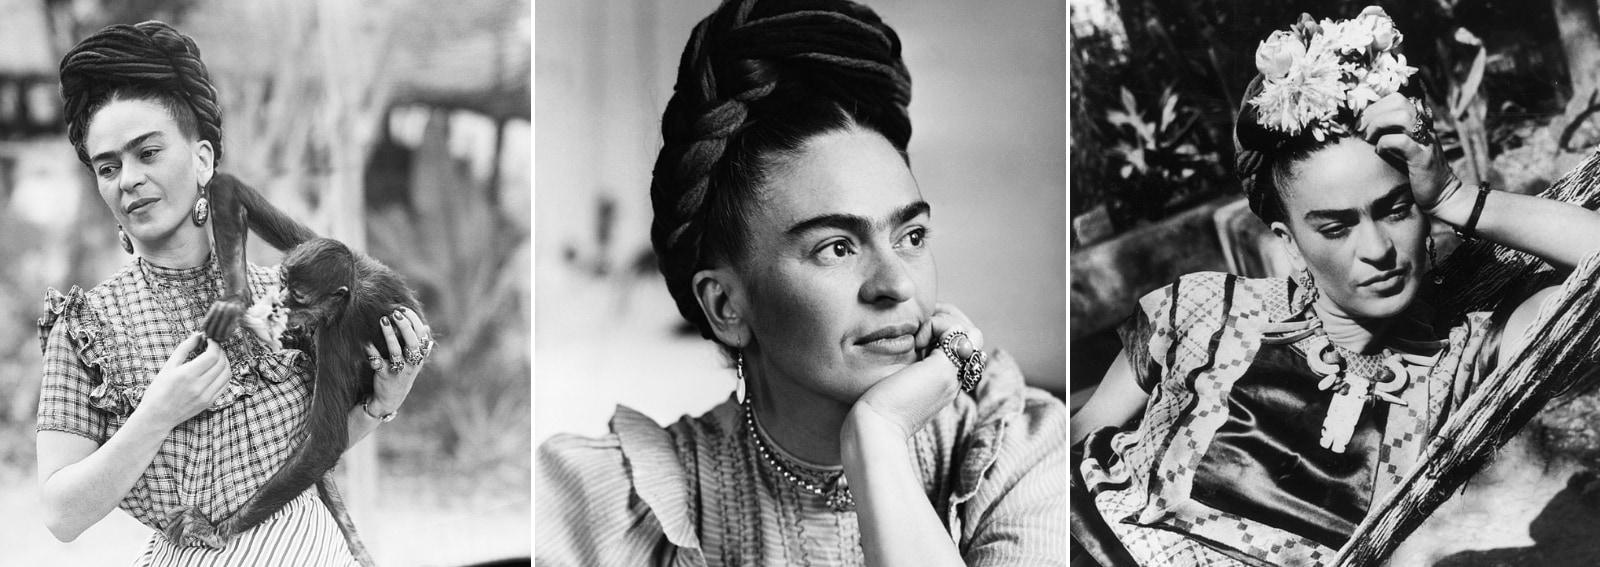 Frida Kahlo pittrice messicana vita opere amori dolori DESK